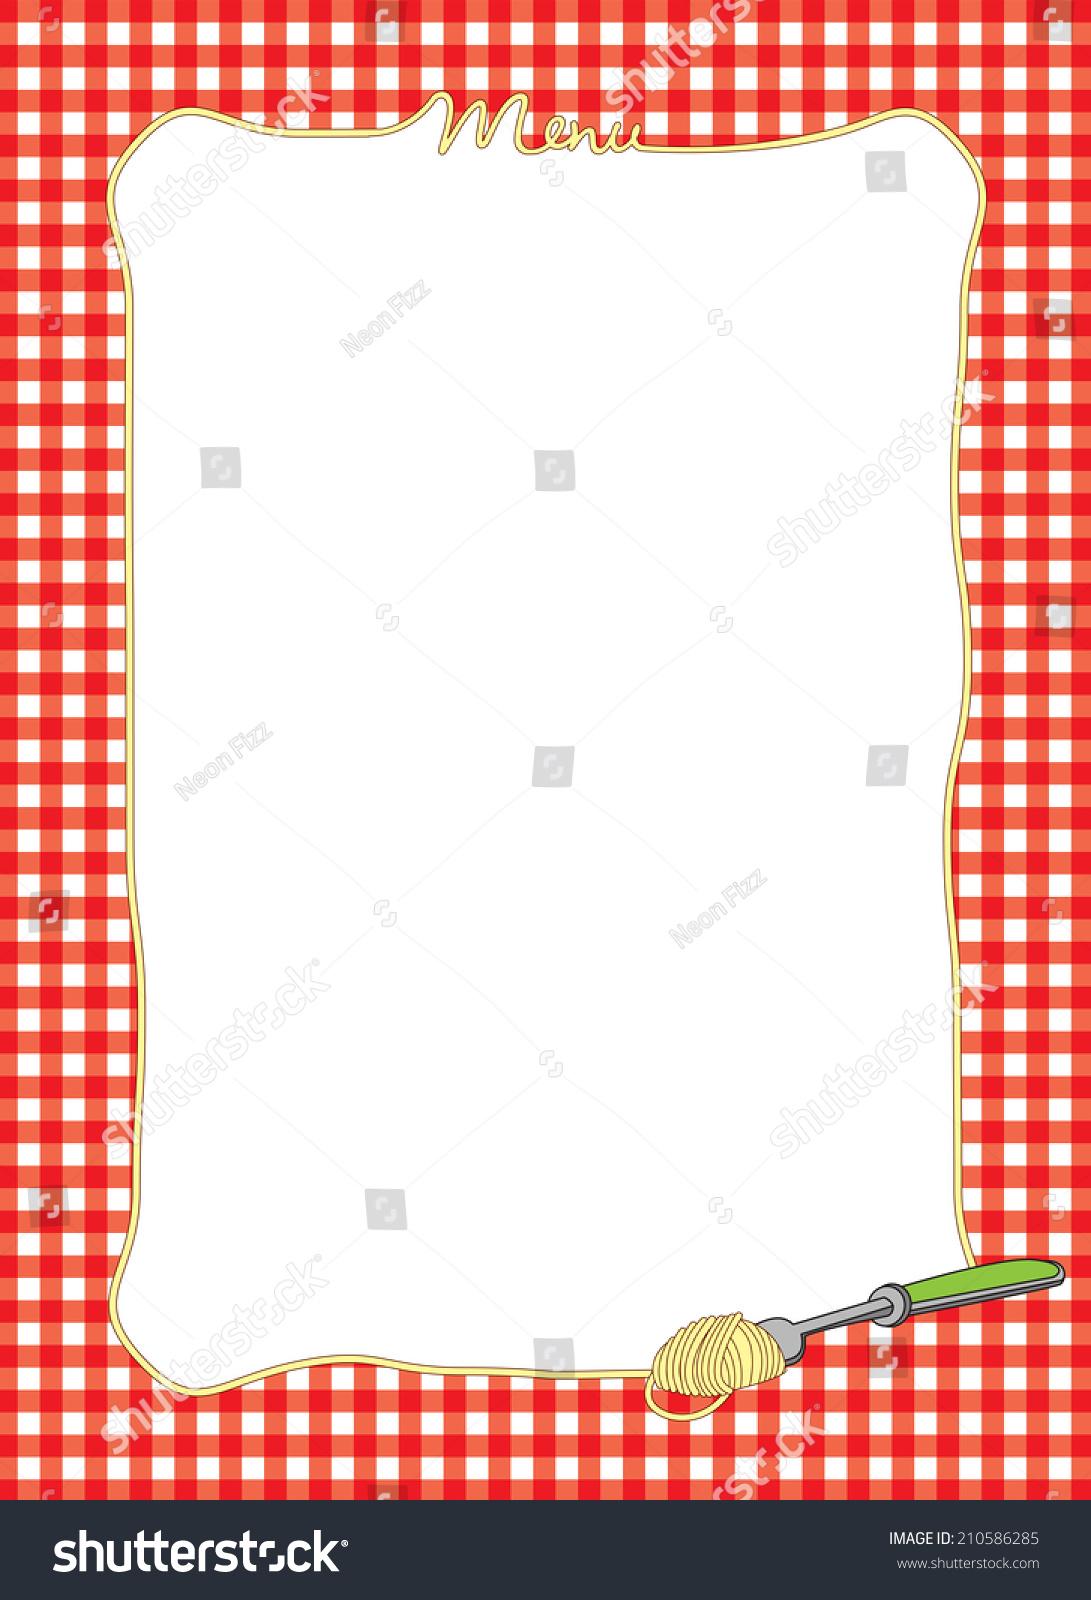 Decorative Menu Border Pasta Red Gingham Stock Illustration ...